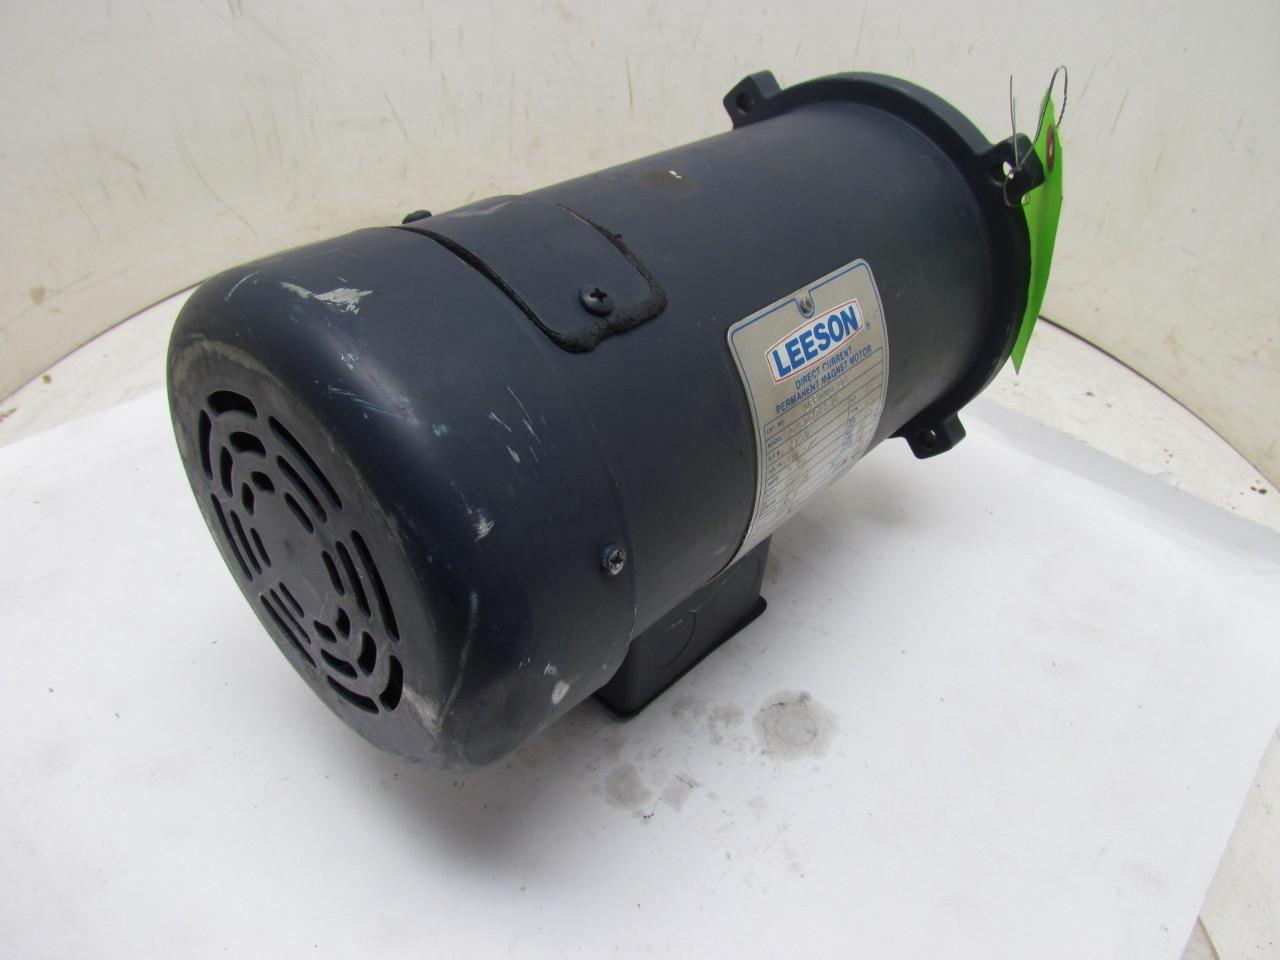 Leeson C42d17fk1a 90vdc Motor 1 2hp 1750 Rpm